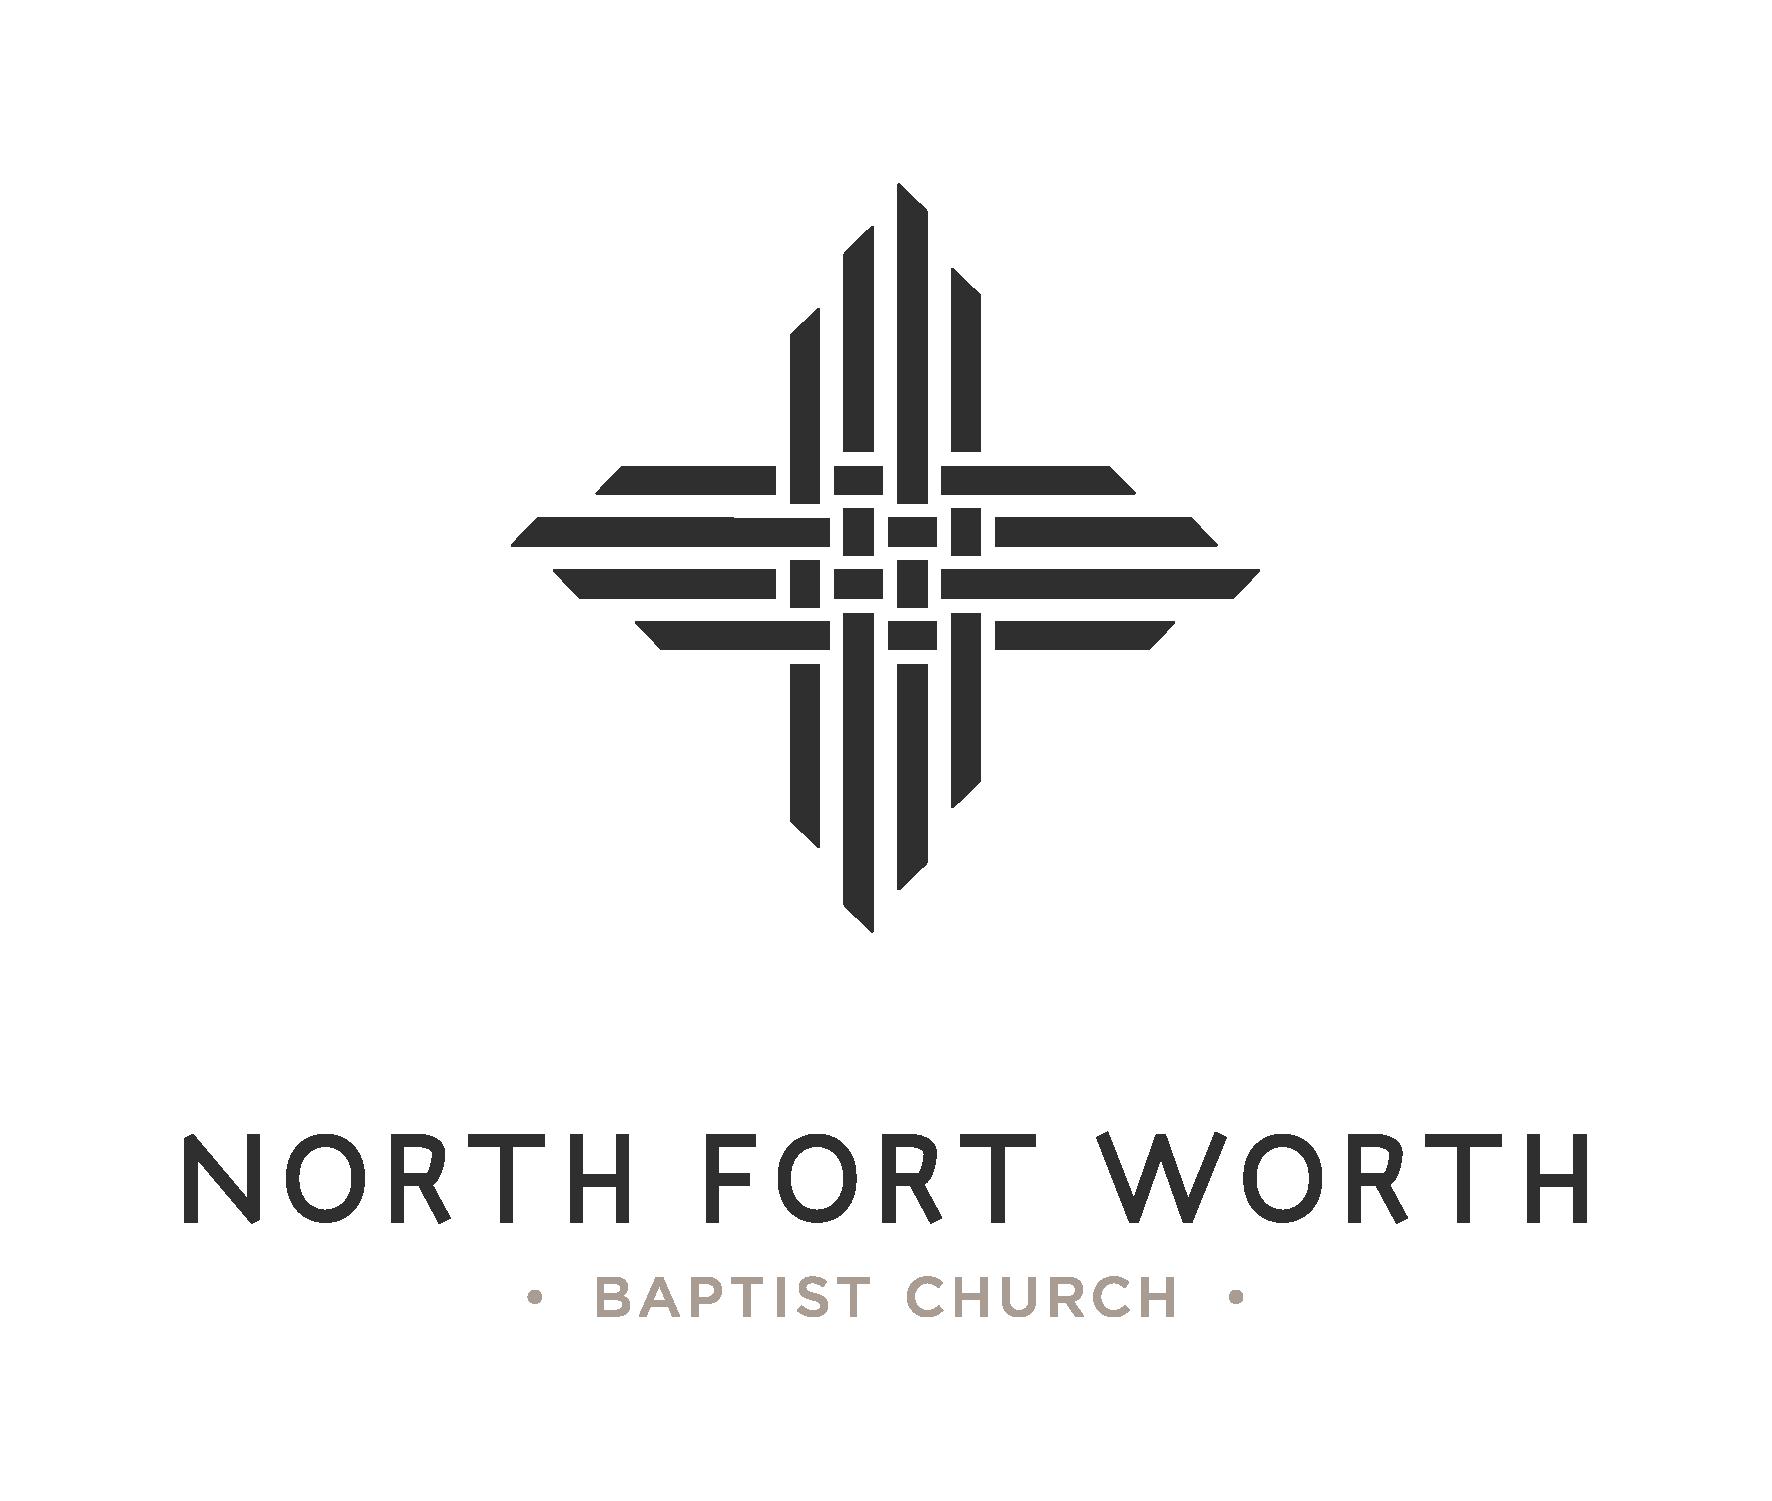 North Fort Worth Baptist Church